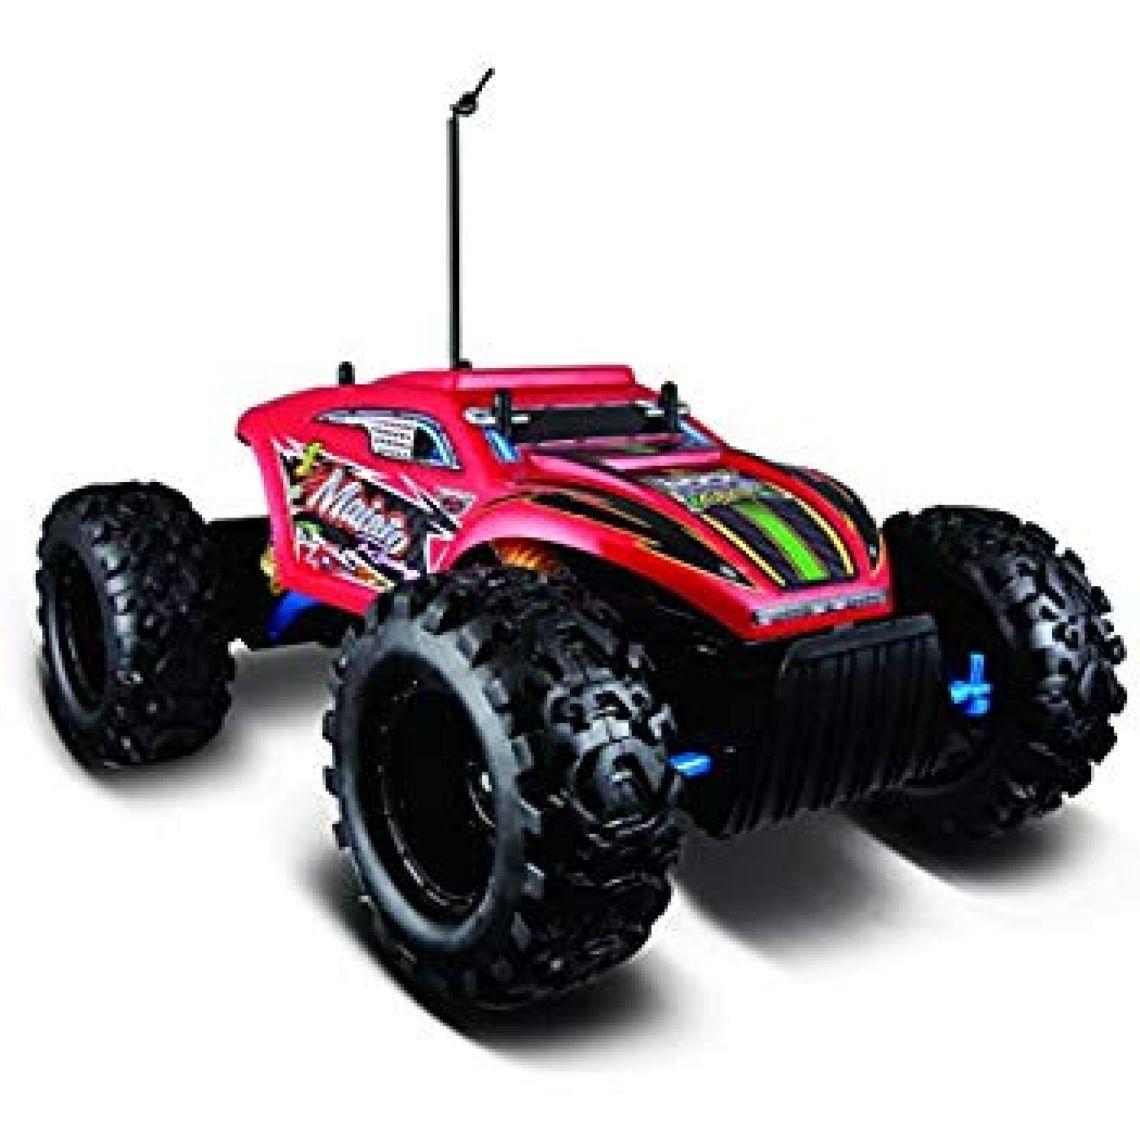 Amazon.com: Maisto R/C Rock Crawler Extreme Radio Control Vehicle, Colors may vary: Toys & Games